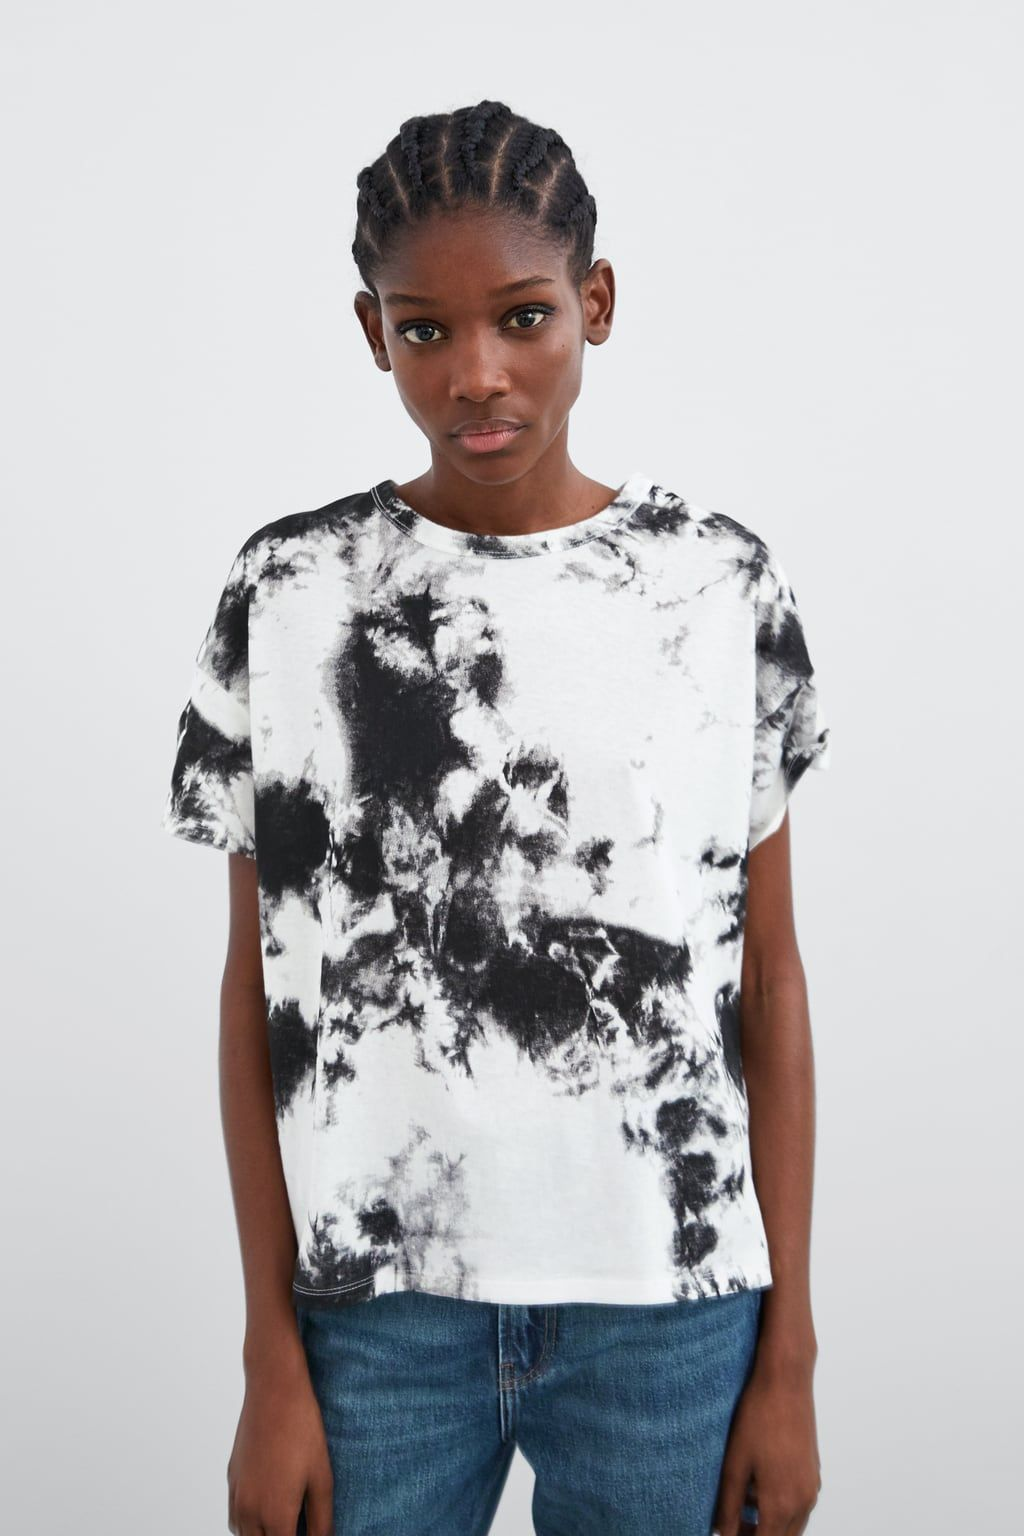 Image 2 Of Printed T Shirt From Zara Tie Dye Print Tie Dye Outfits Tie Dye [ 1536 x 1024 Pixel ]